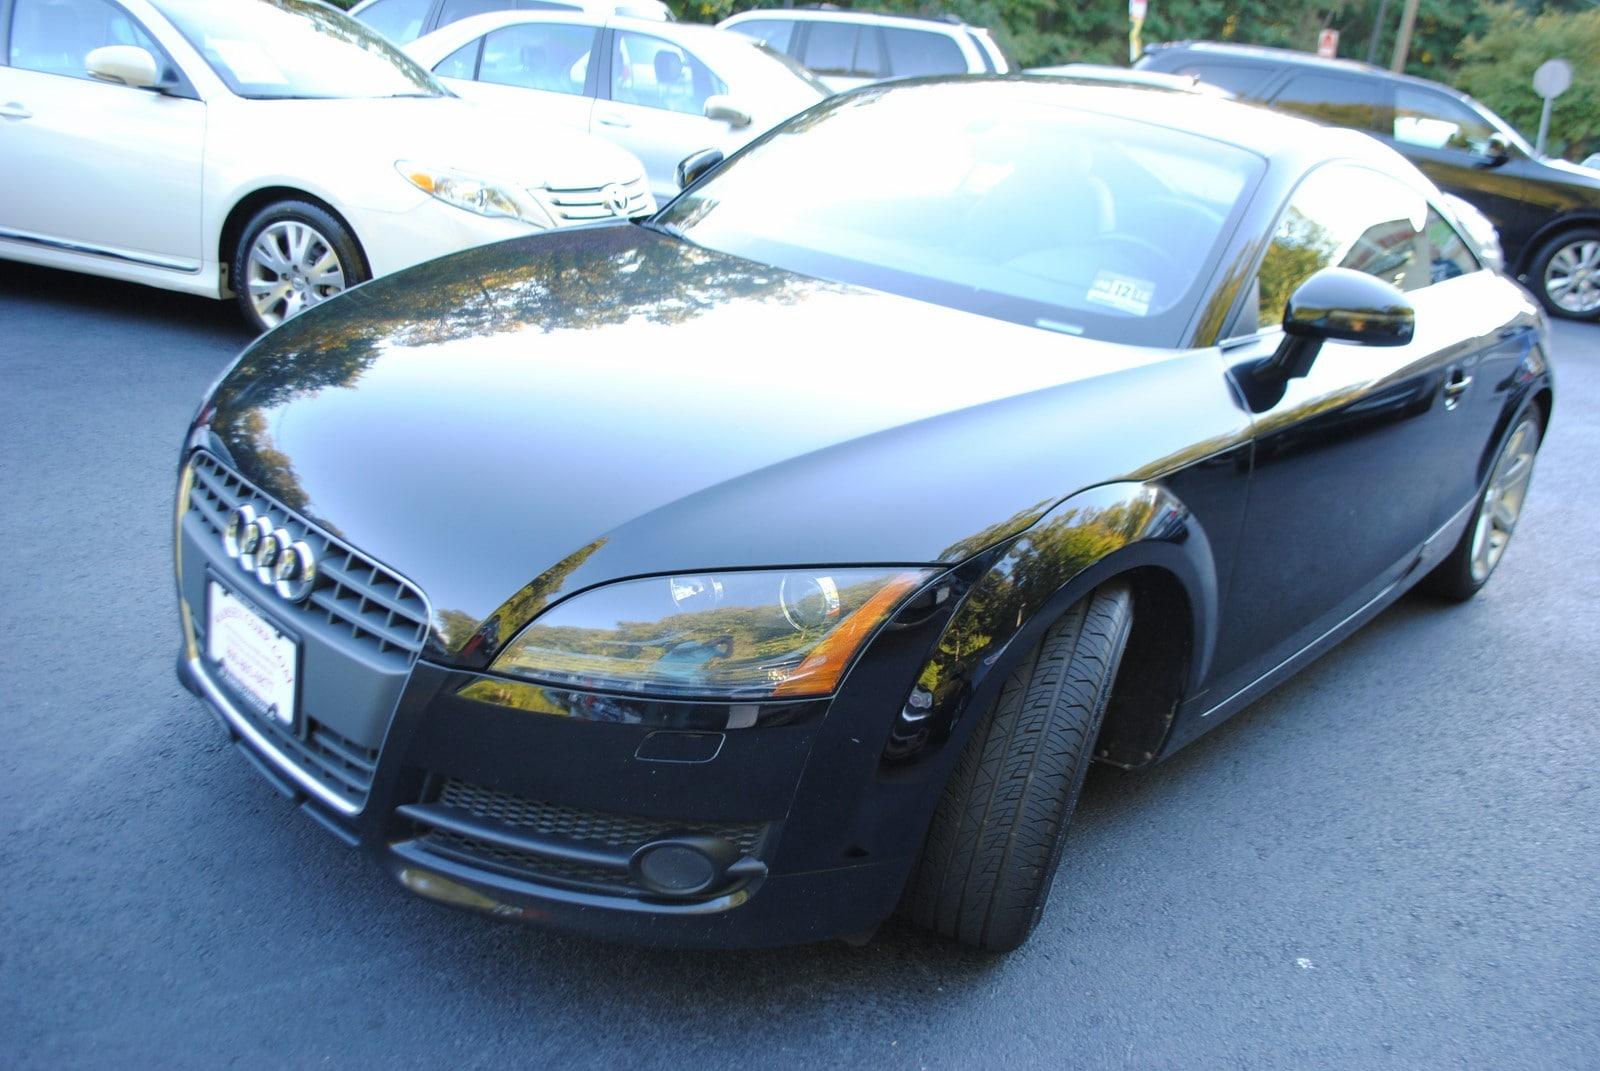 used 2008 audi tt for sale west milford nj rh ramseycorp com Audi TT Interior 2015 Audi TT Manual Transmission